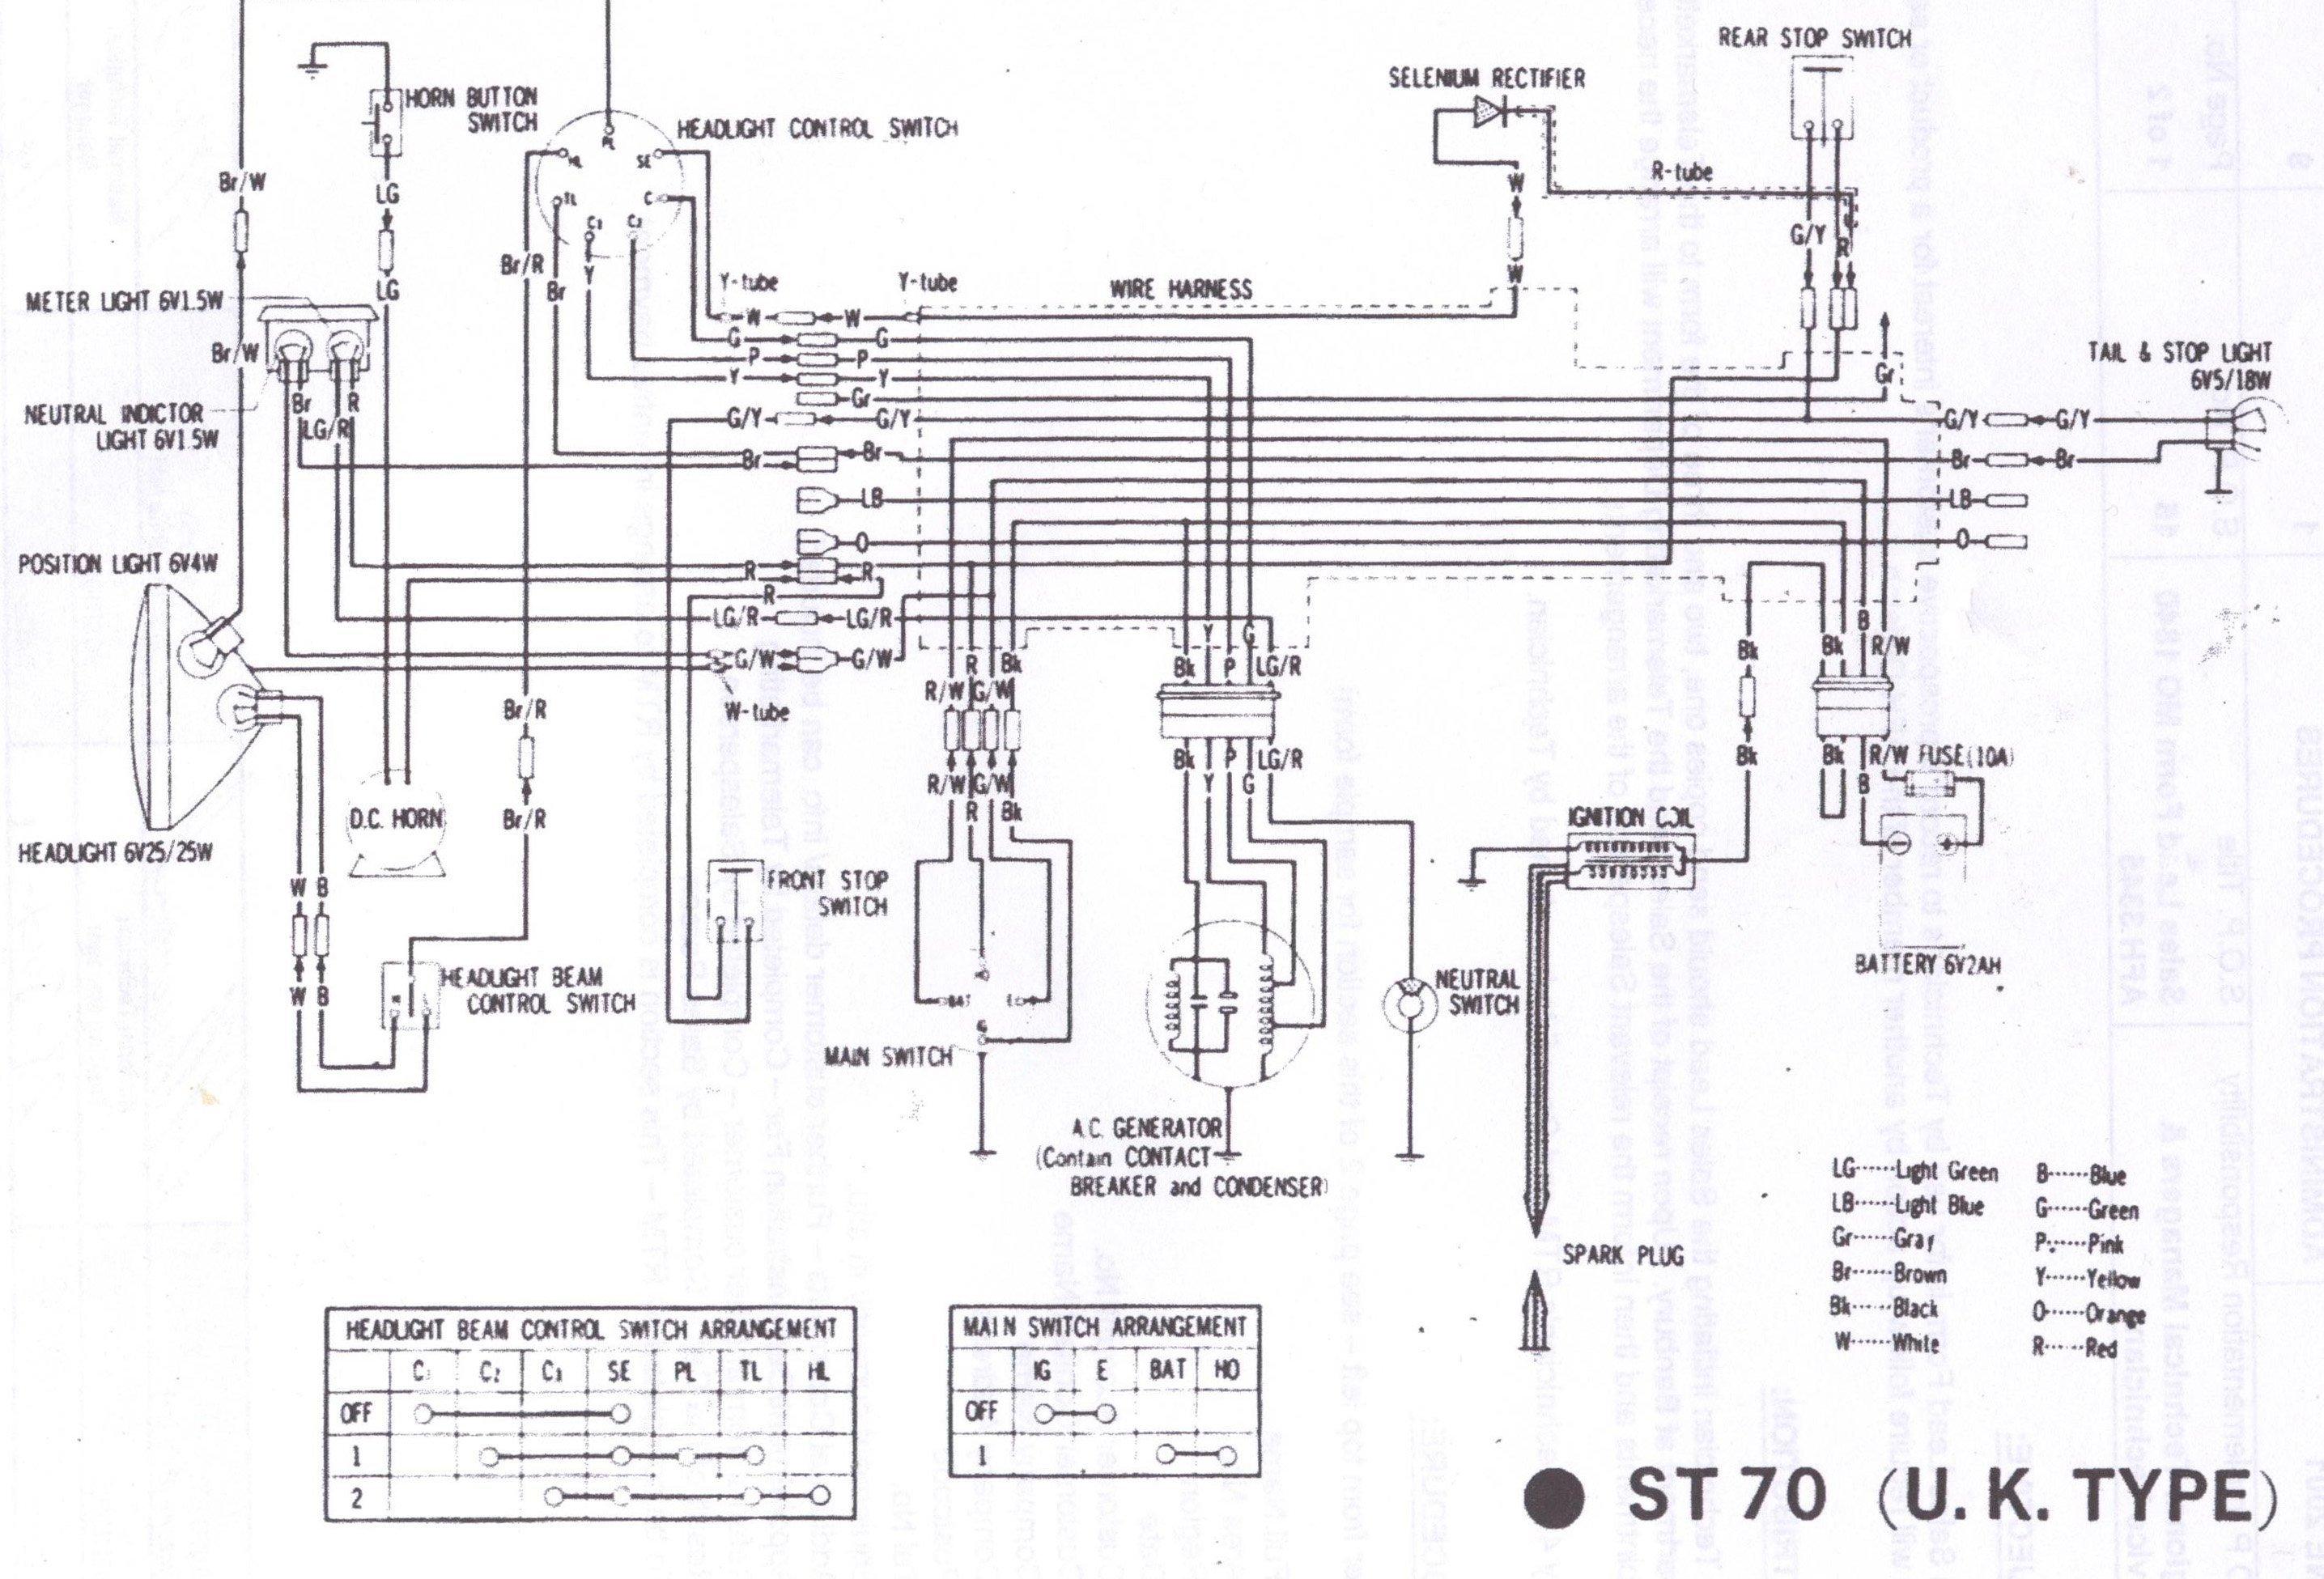 honda crf 90 wiring diagram - 66 ford ranchero wiring diagram - schematics -source.yenpancane.jeanjaures37.fr  wiring diagram resource